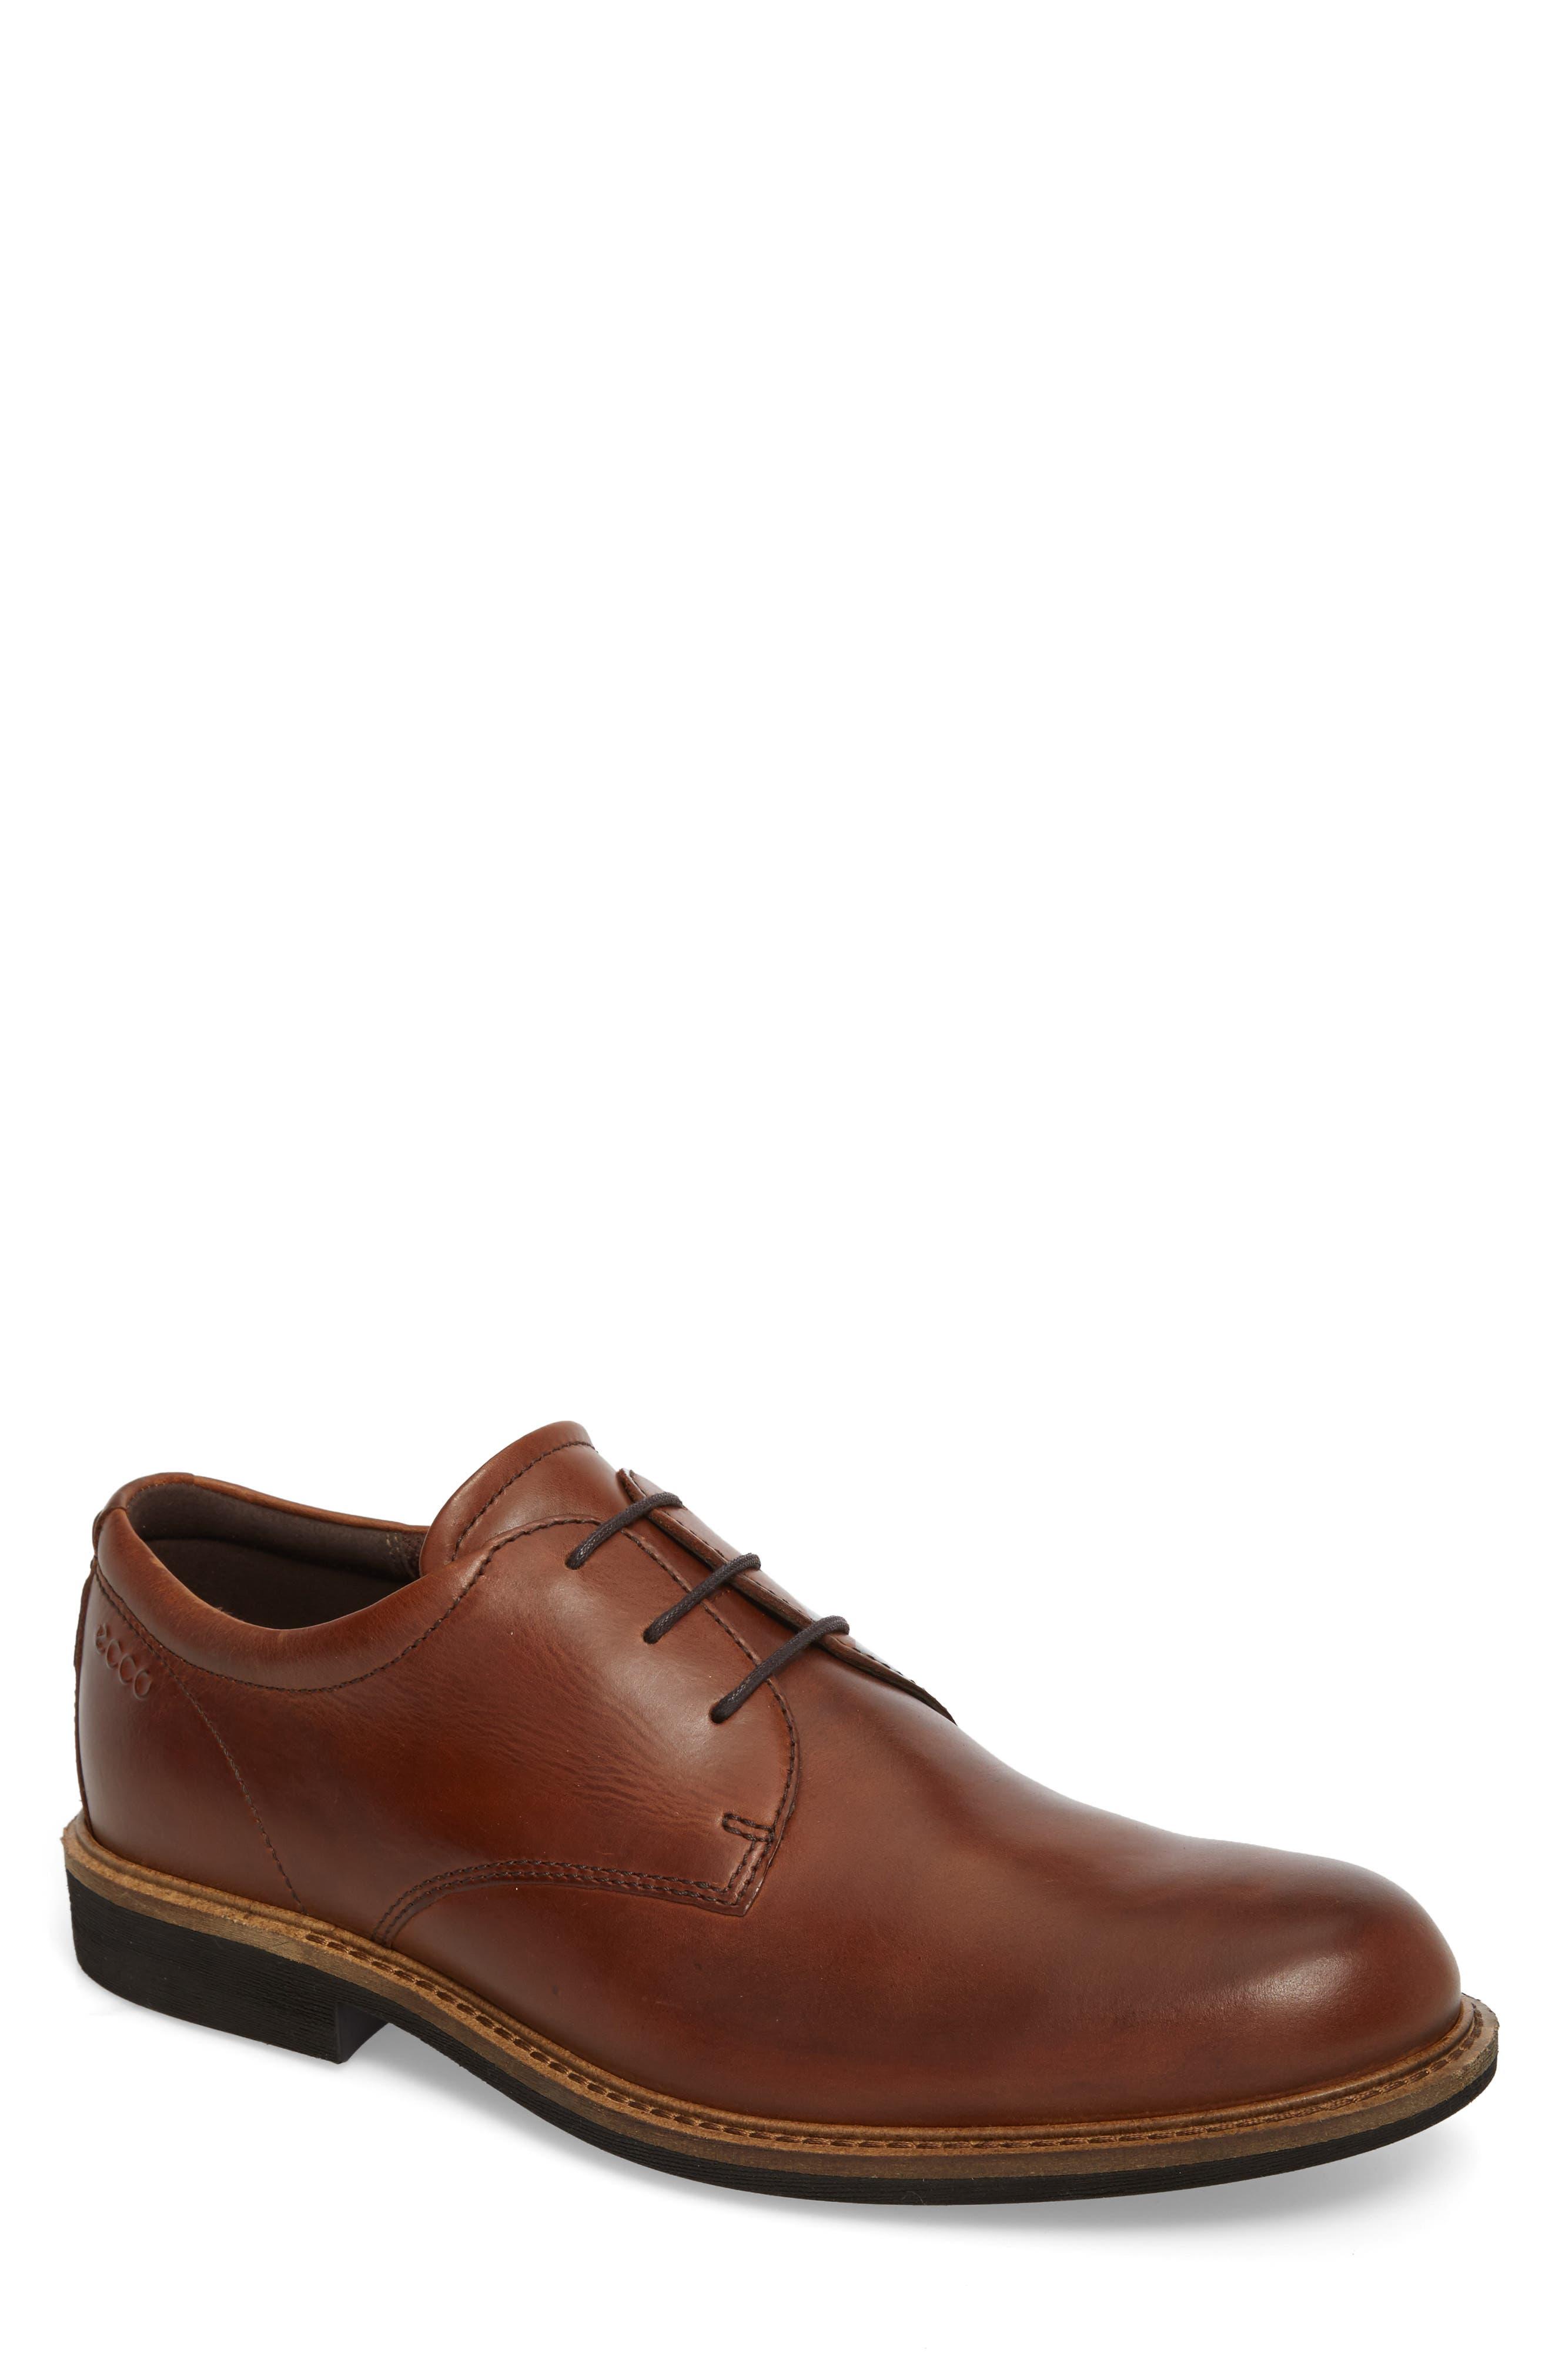 Findlay Plain Toe Derby,                         Main,                         color, Cognac Leather